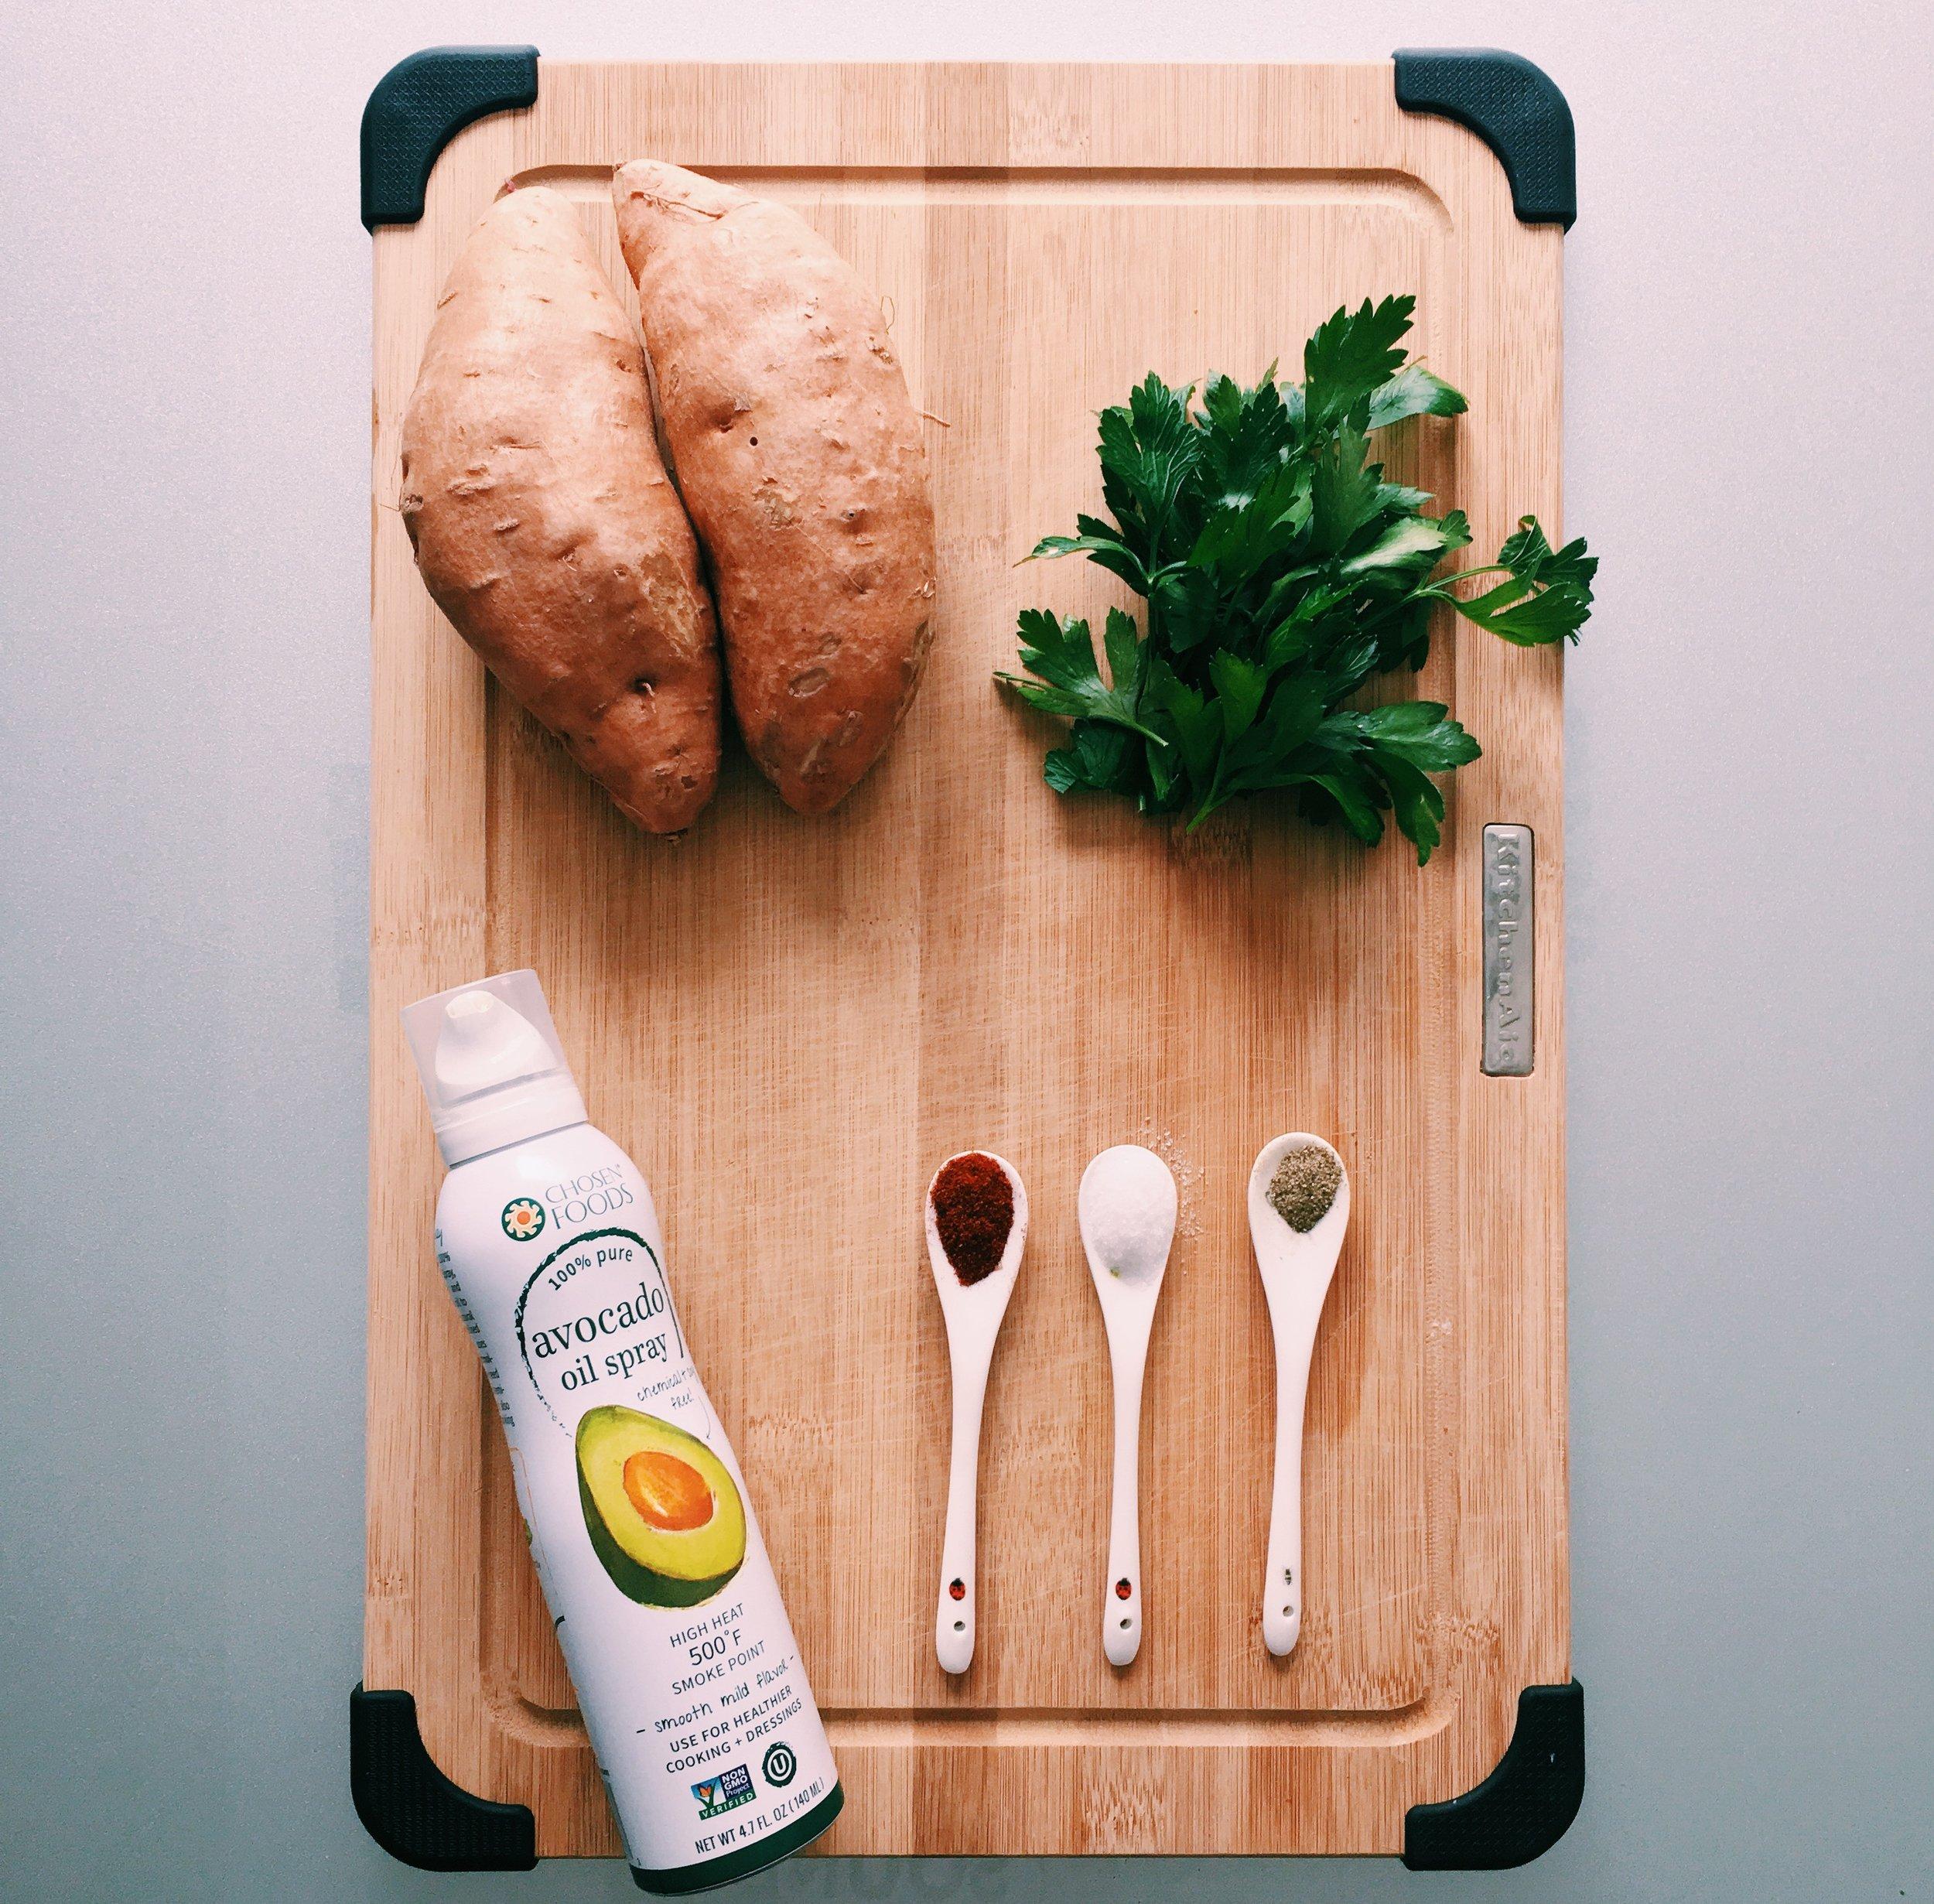 Baked Sweet Potato Fries ingredients